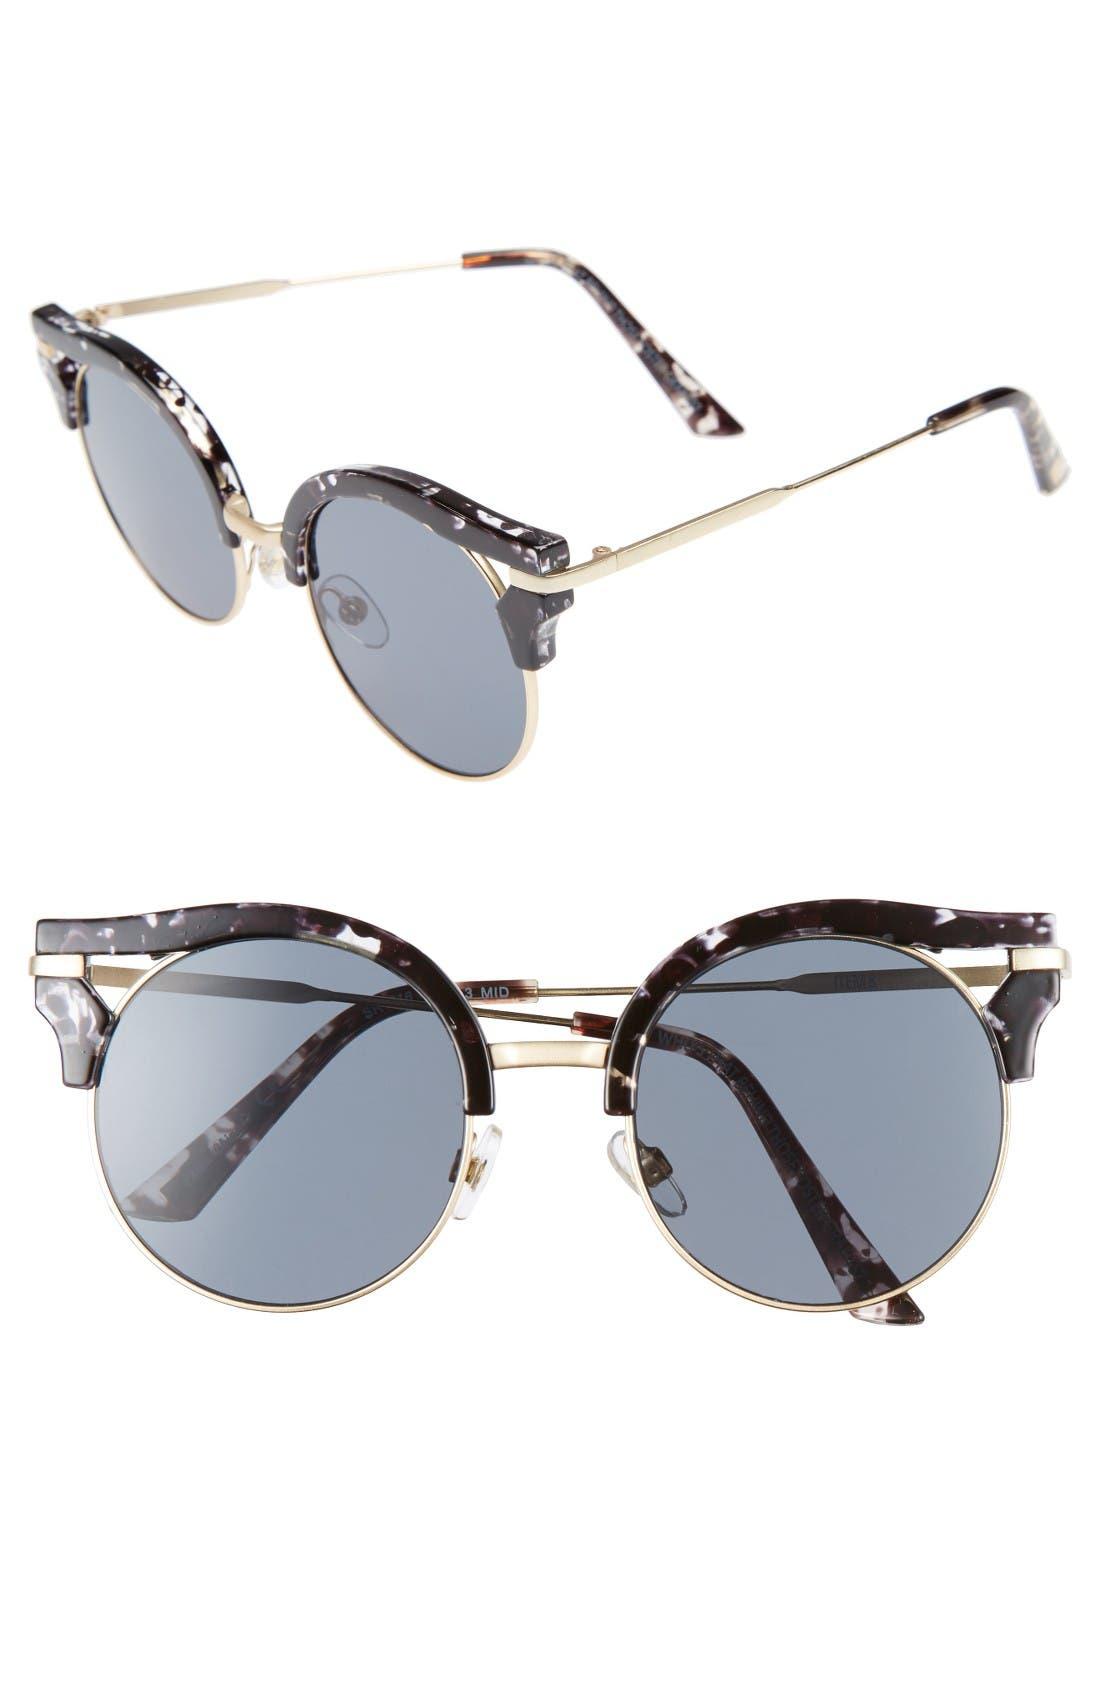 ITEM 8 MS.3 51mm Sunglasses